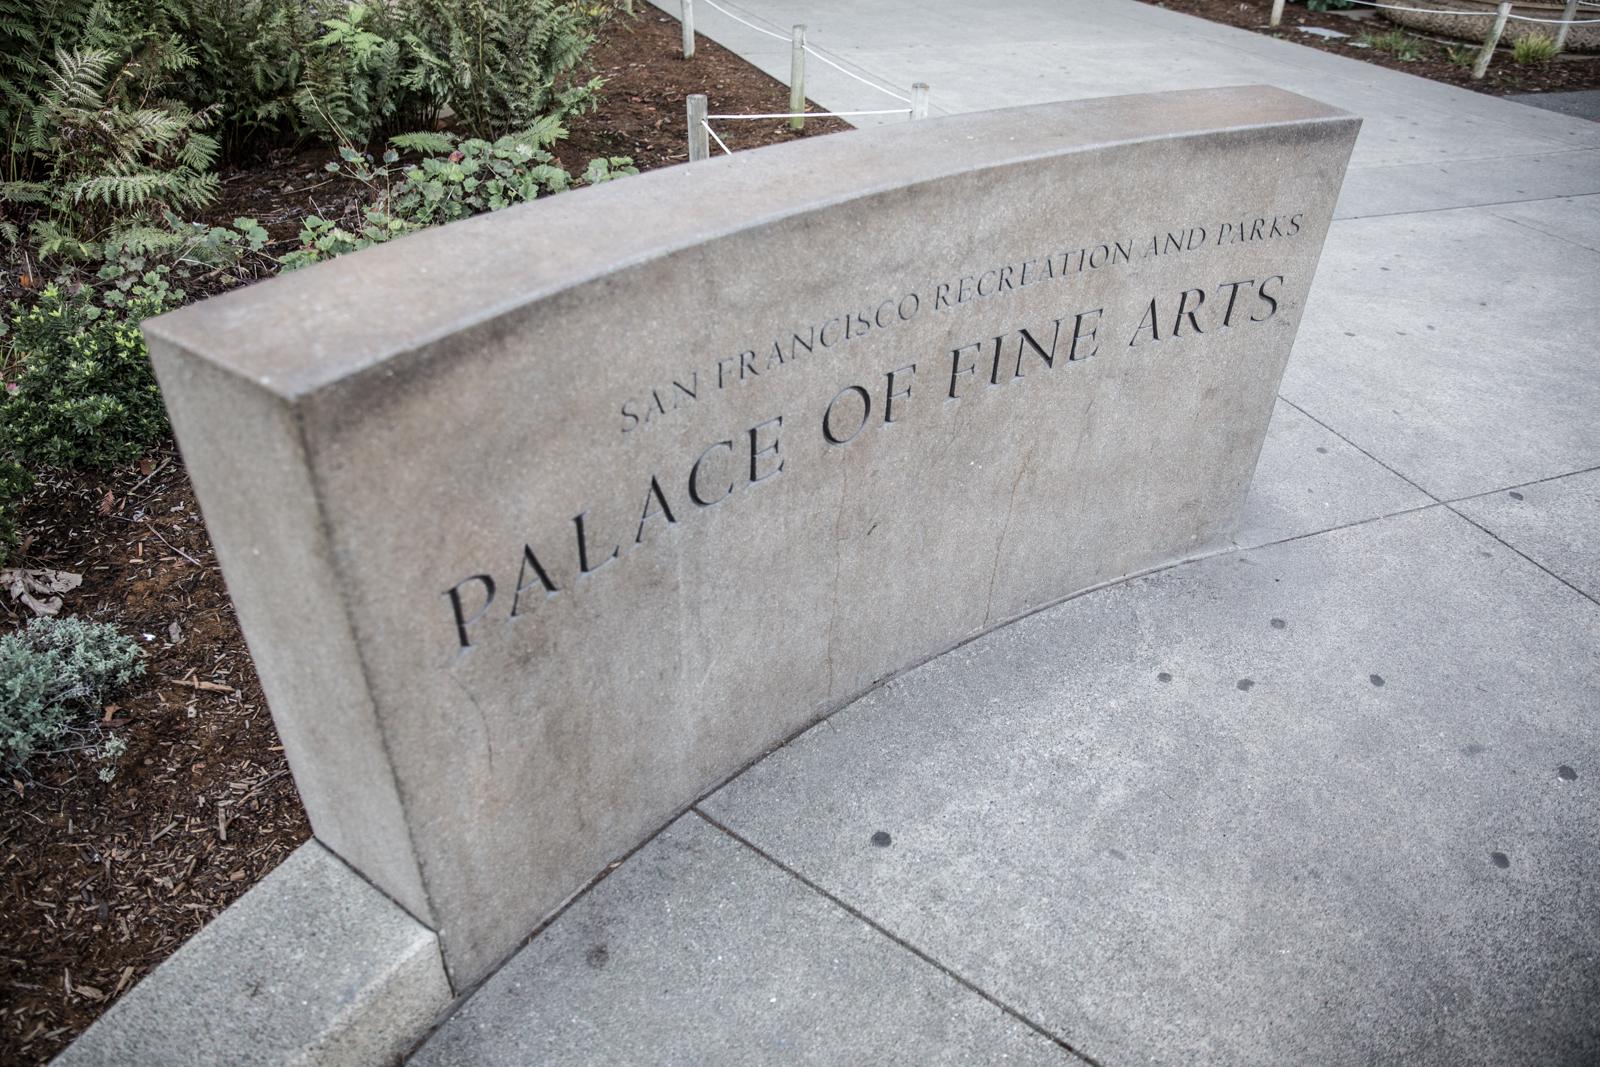 palace of fine arts san francisco-9320